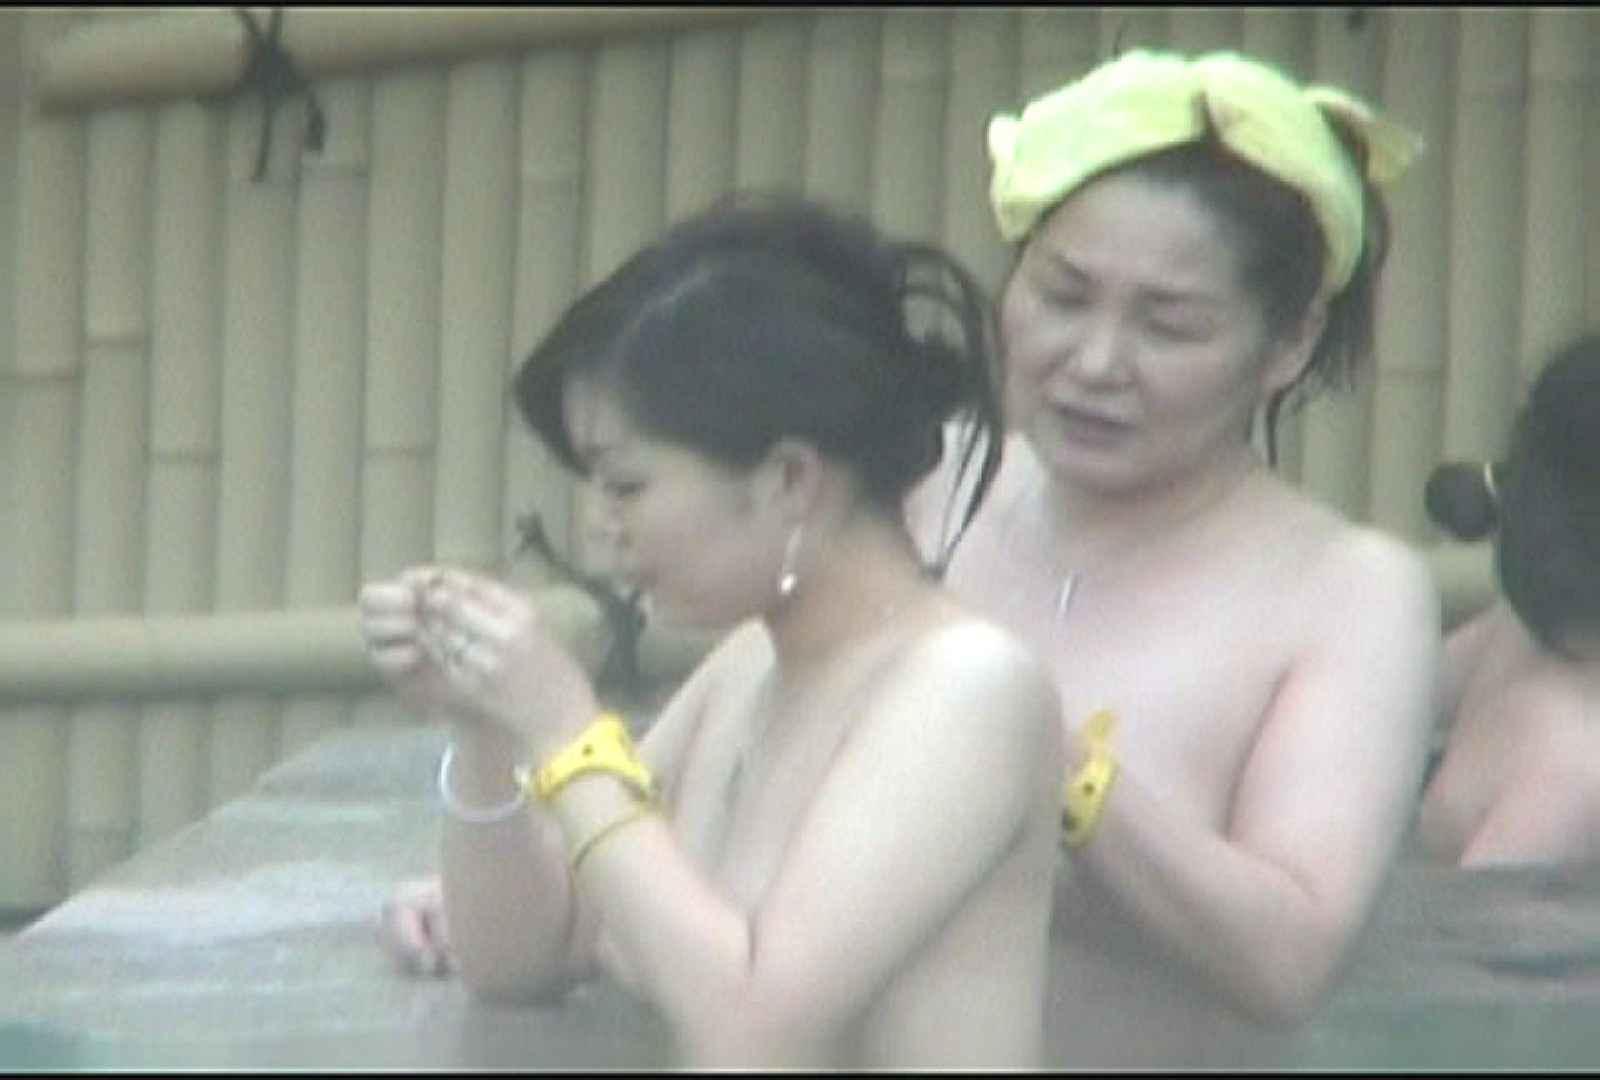 Aquaな露天風呂Vol.145 盗撮   OLセックス  106画像 61